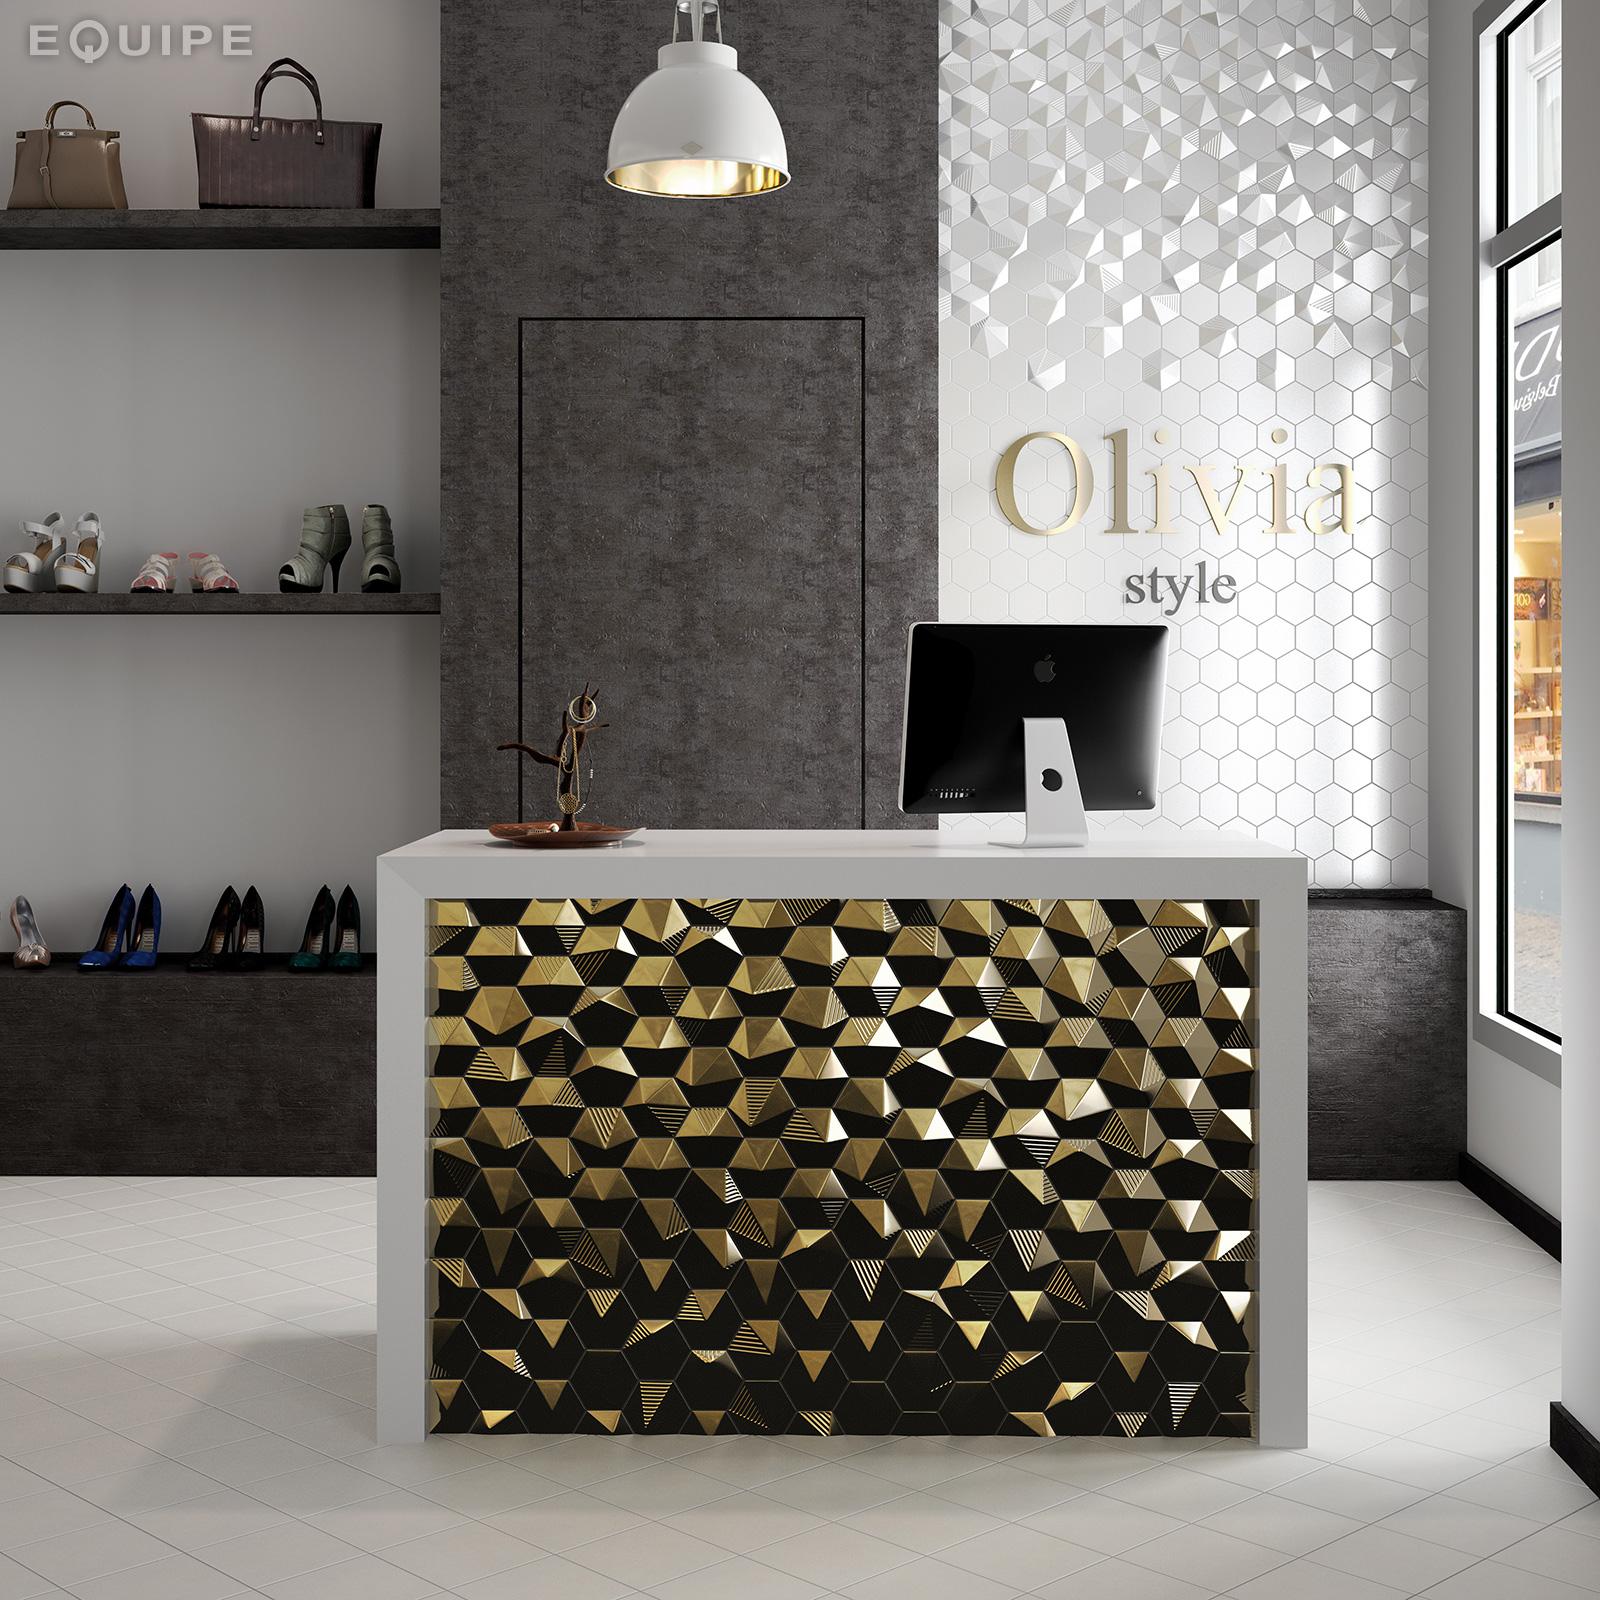 Equipe Tiles Ceramic Systems Carlisle